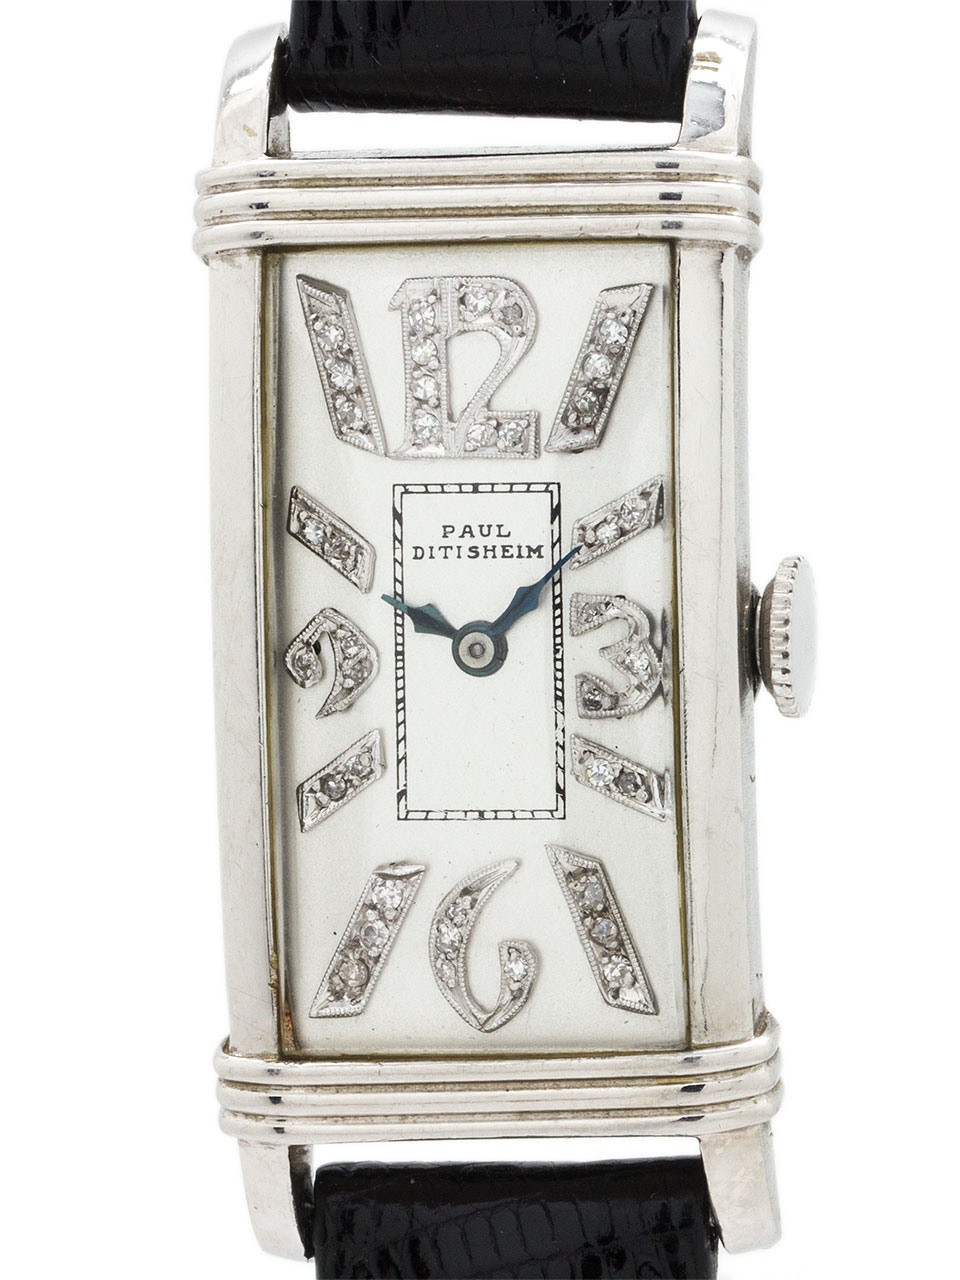 Platinum Art Deco Diamond Dial Paul Ditisheim circa 1930's